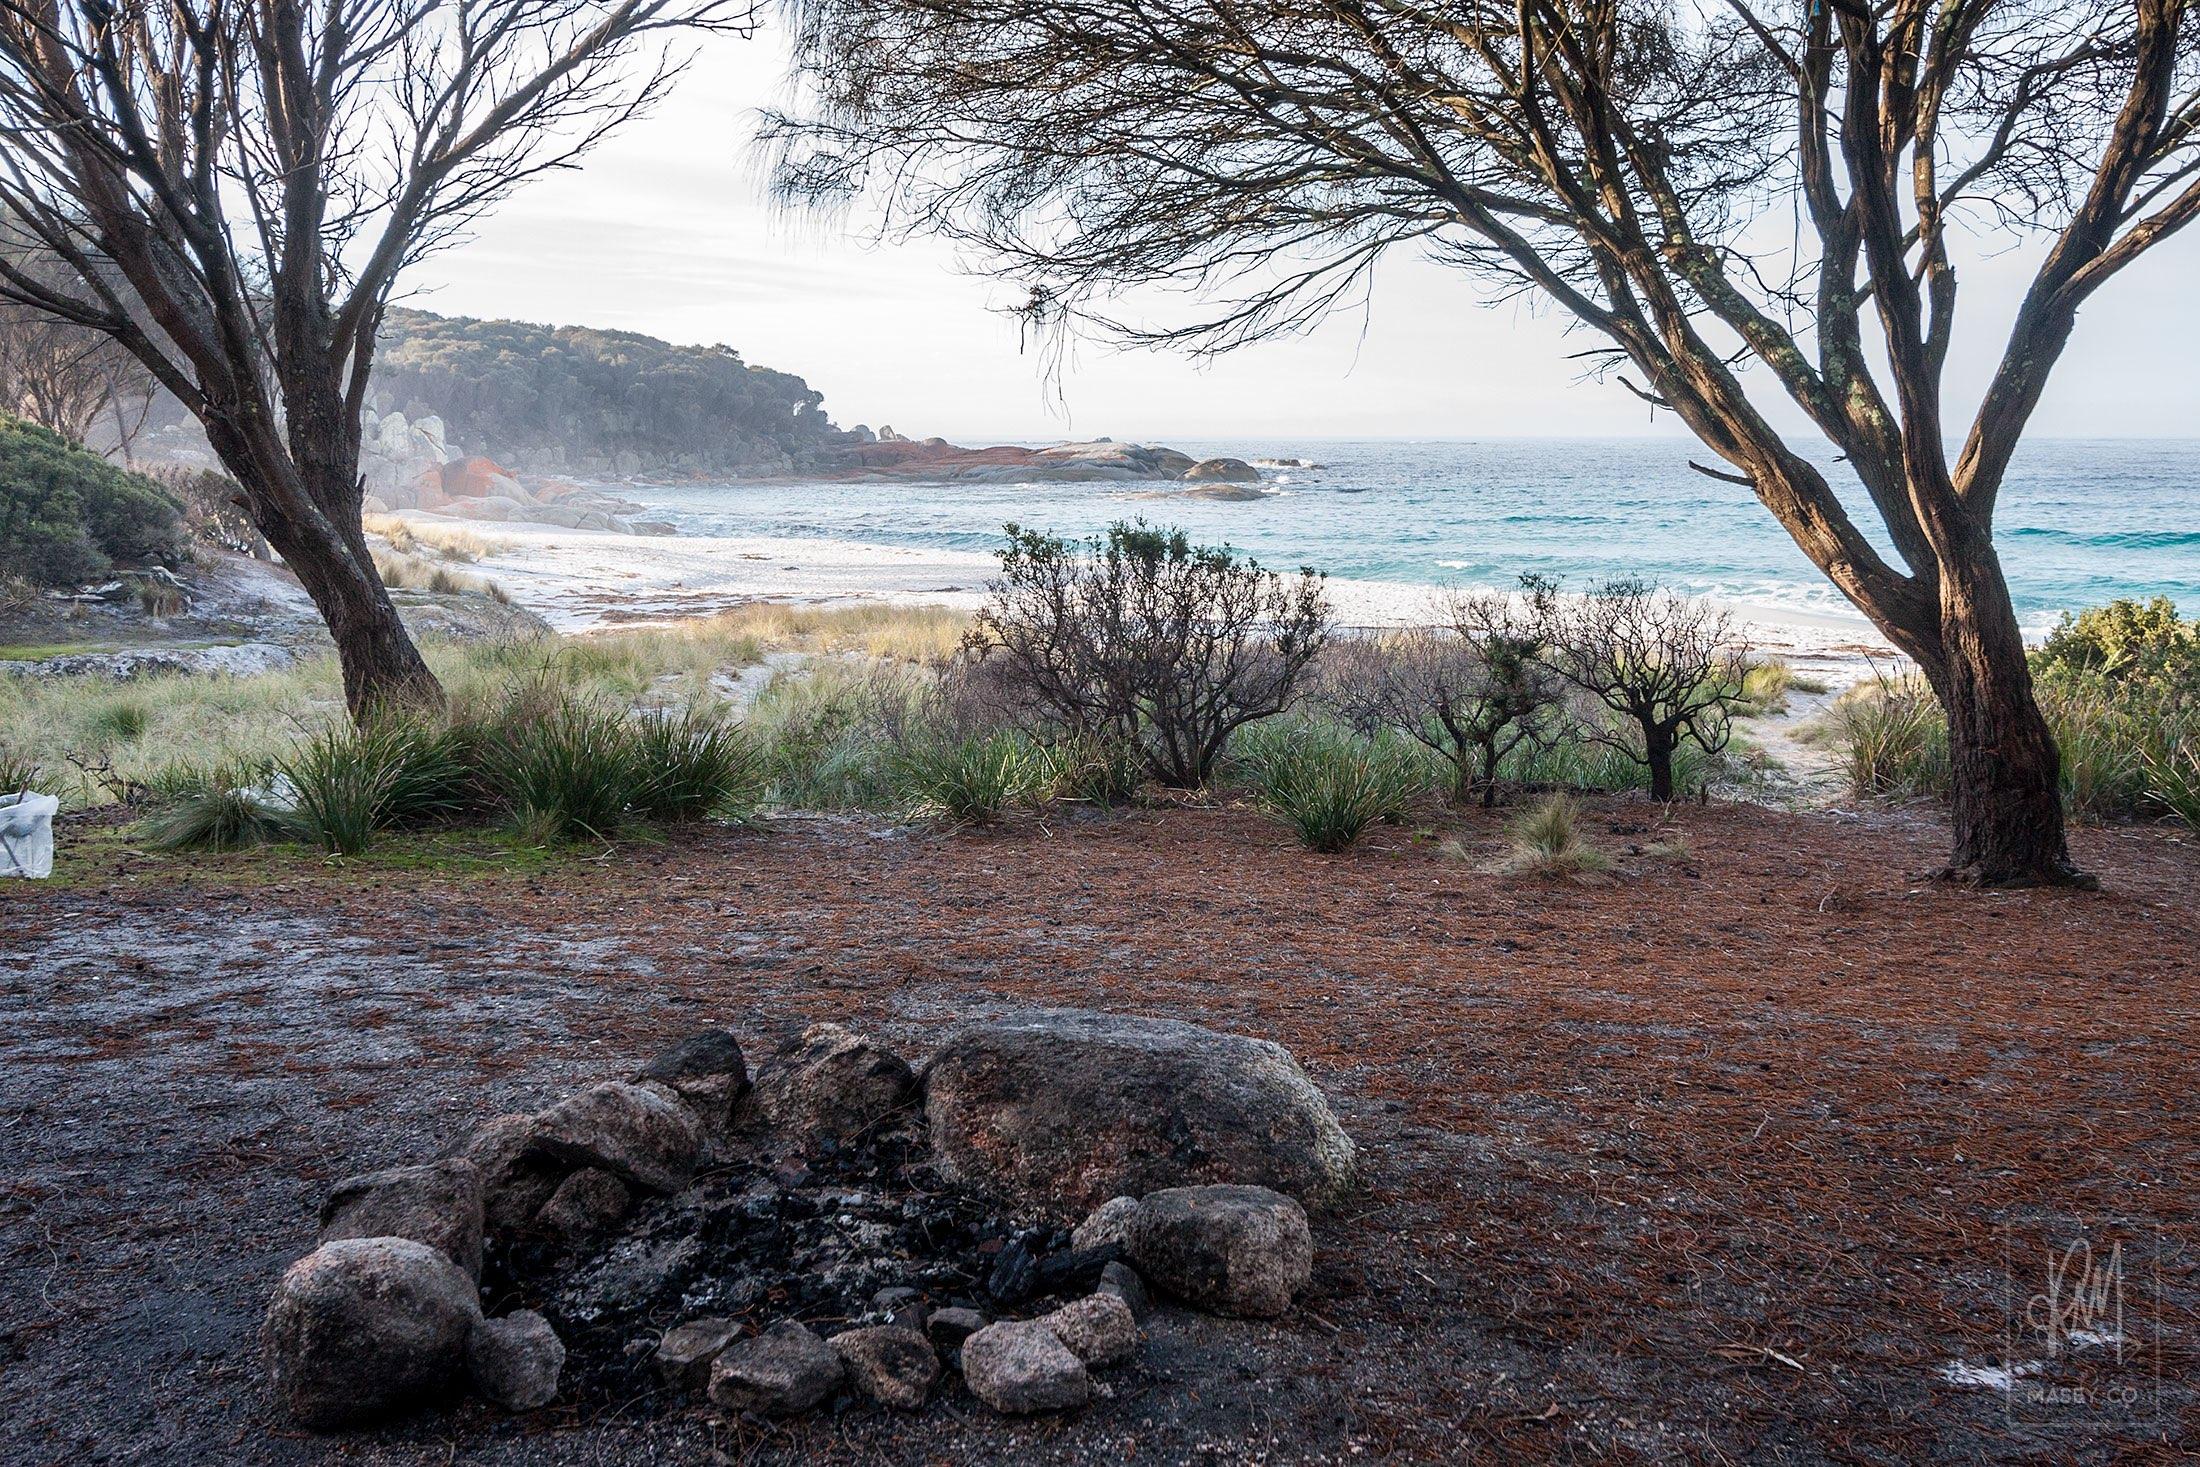 Tasmania's 'Bay of Fires'